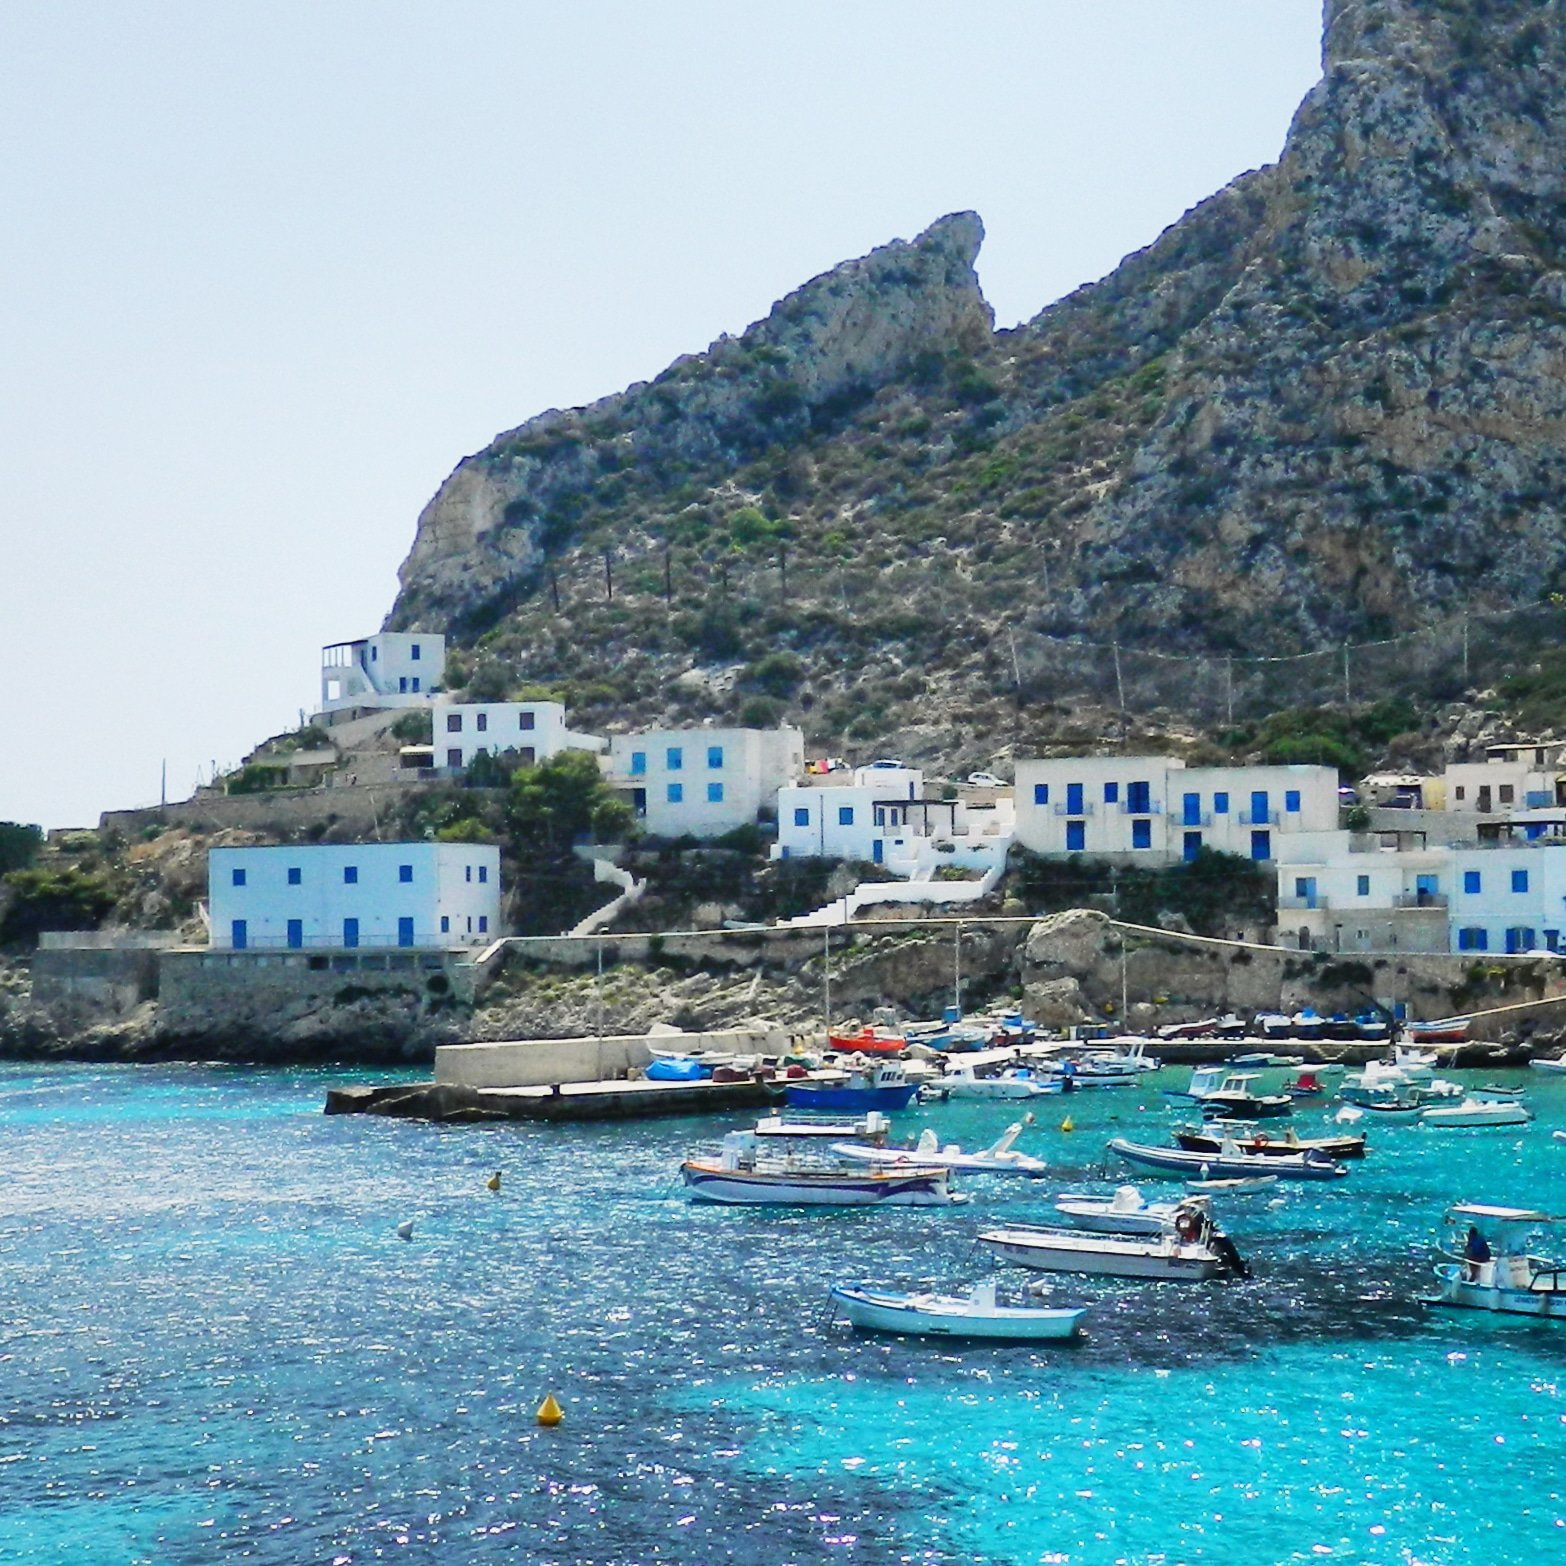 52 Reasons to Love Sicily   #27. Island Hopping